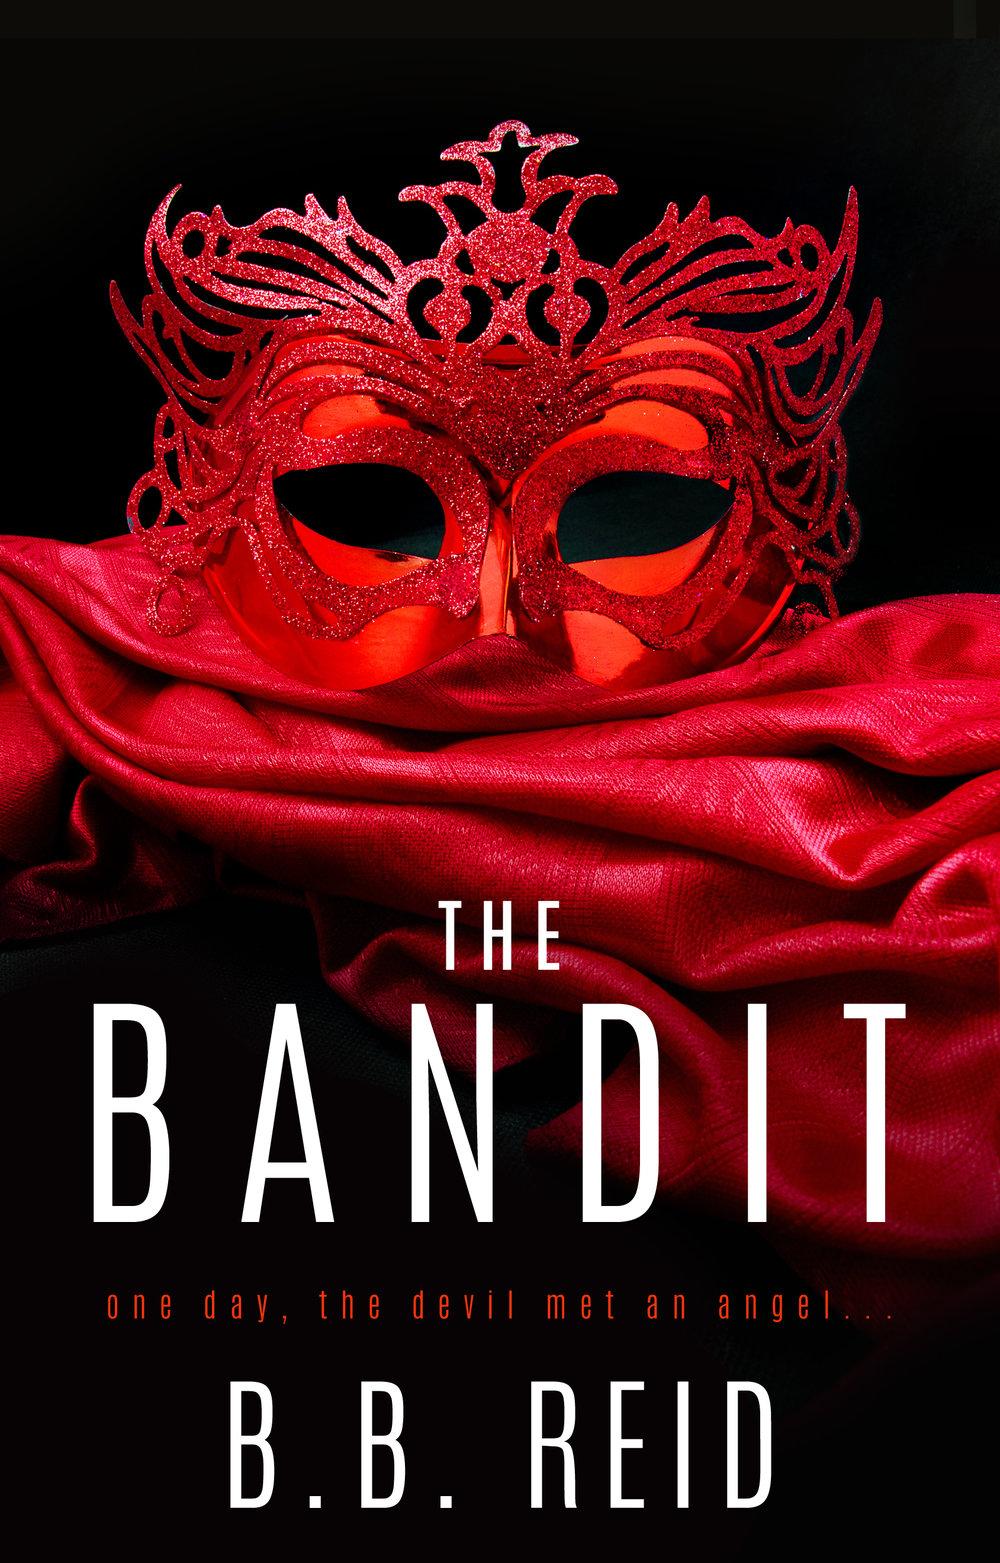 TheBandit.jpg